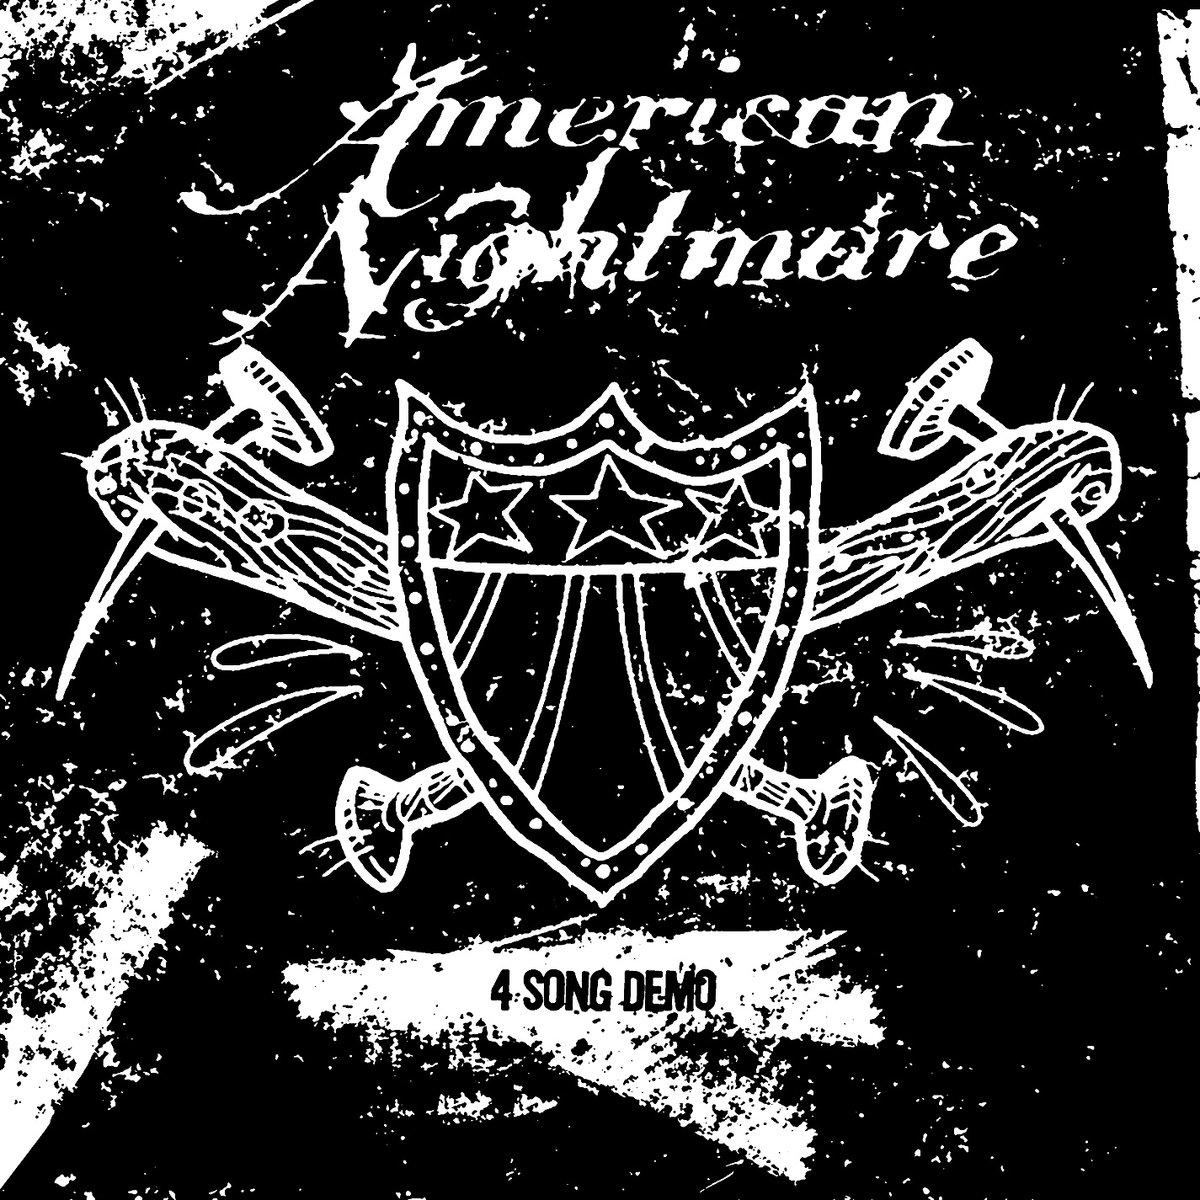 American Nightmare - 4 Song Demo 7